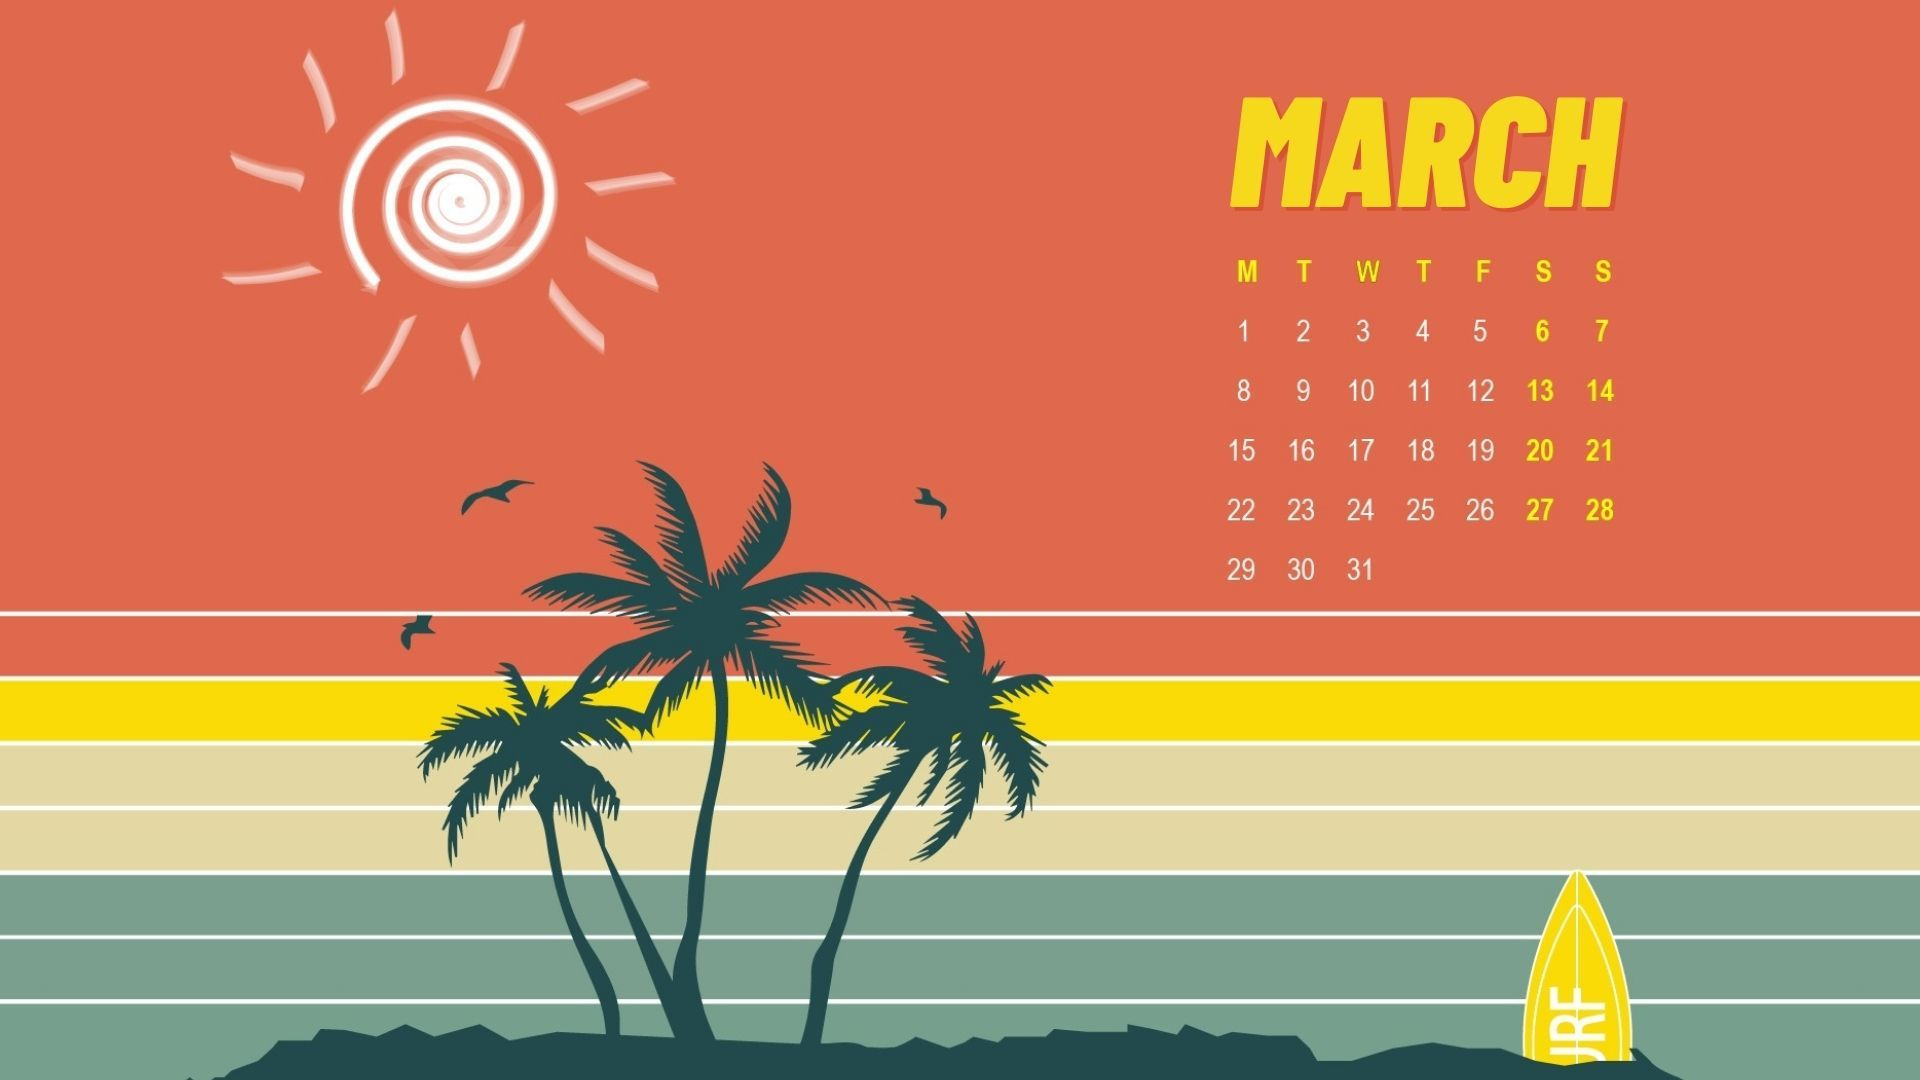 March 2021 Desktop Calendar March 2021 HD calendar wallpaper free download in high definition